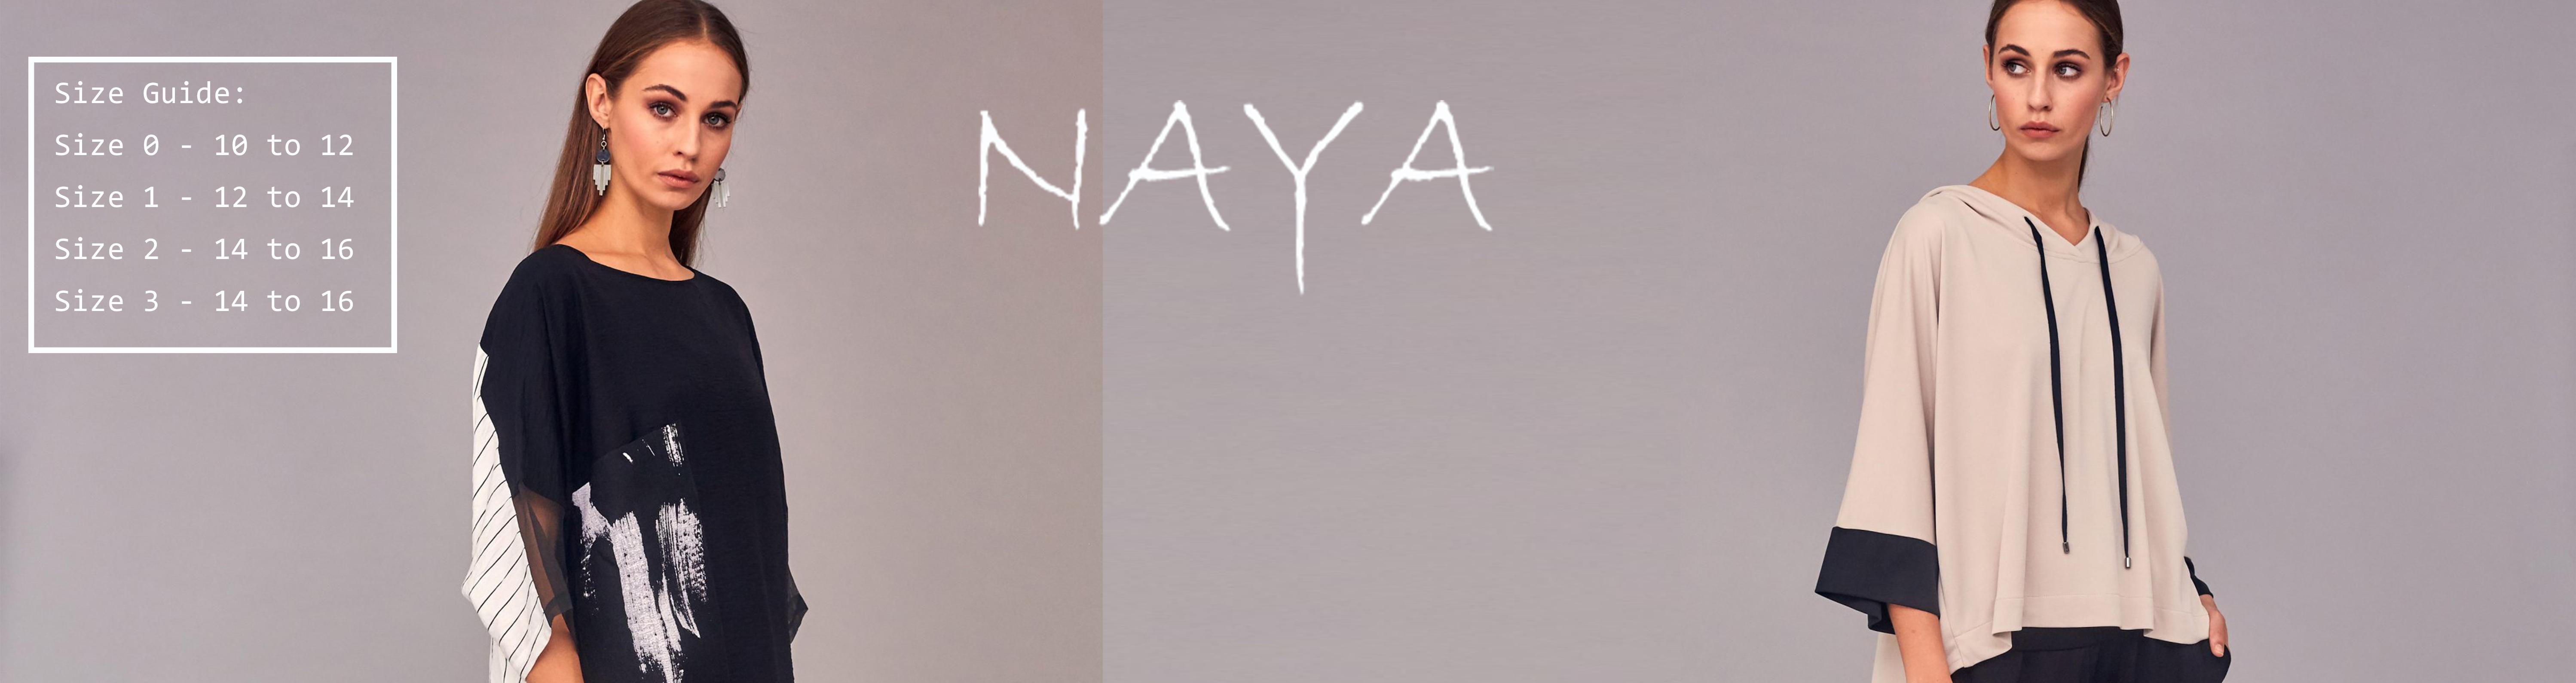 naya-header-spring-21.jpg